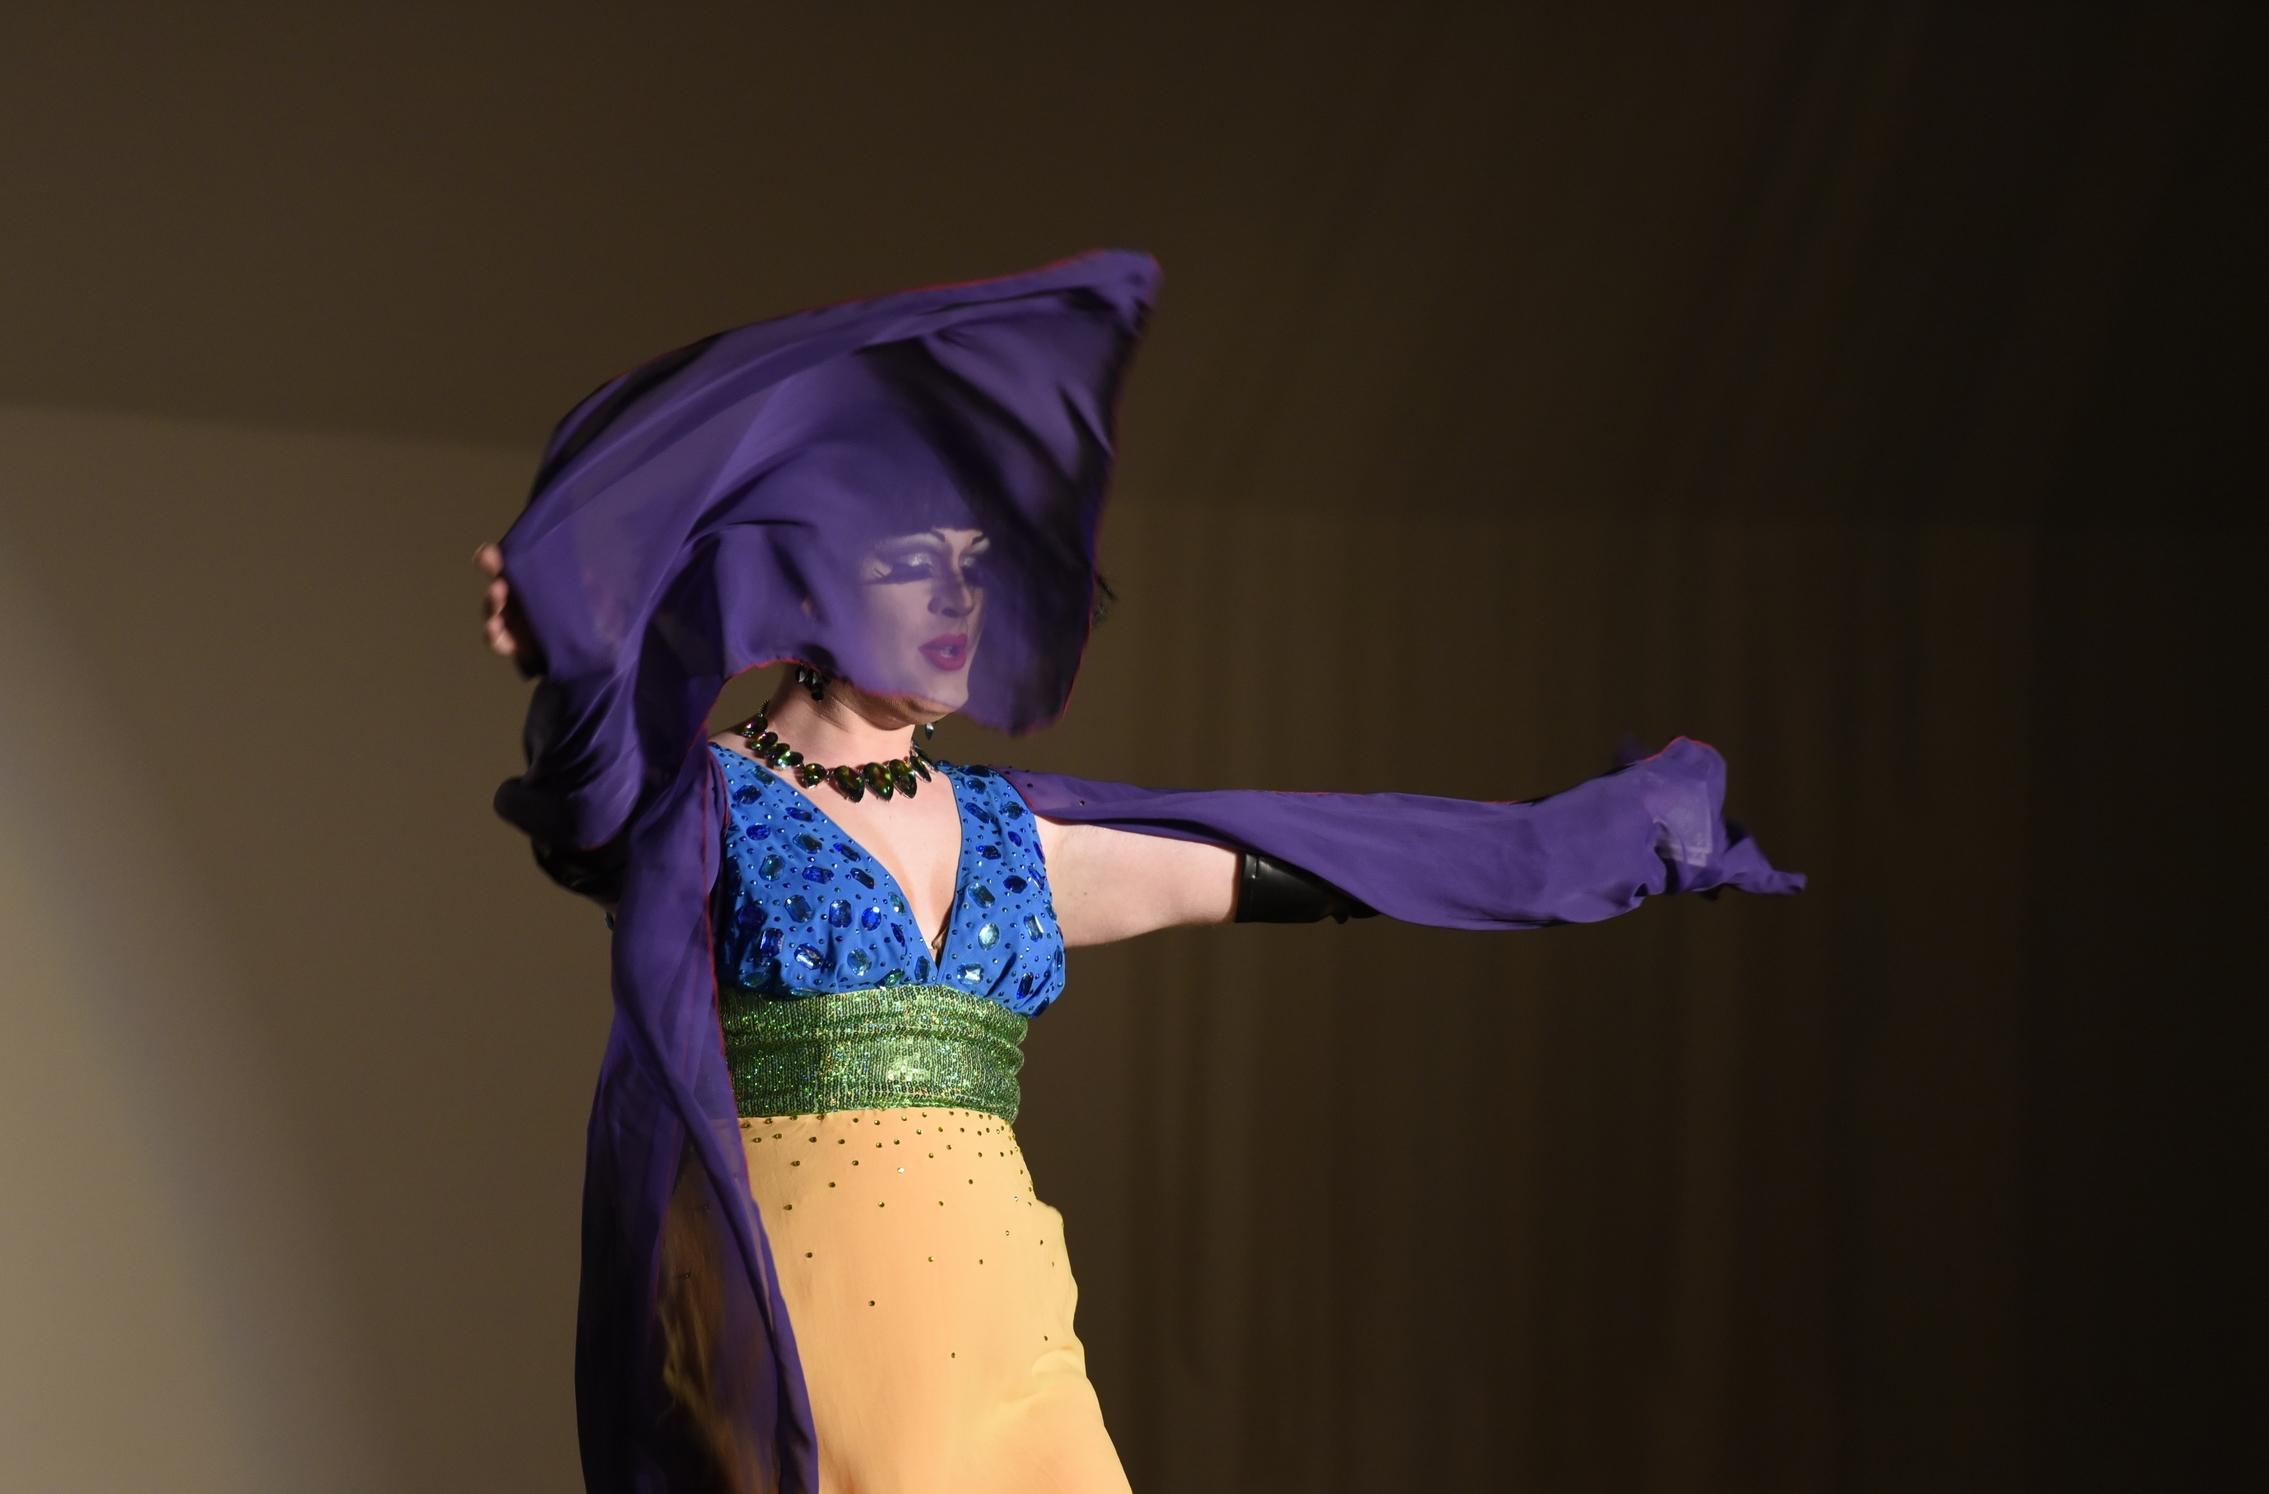 Bemidji State's Phoenix Club hosted a drag show at BSU.